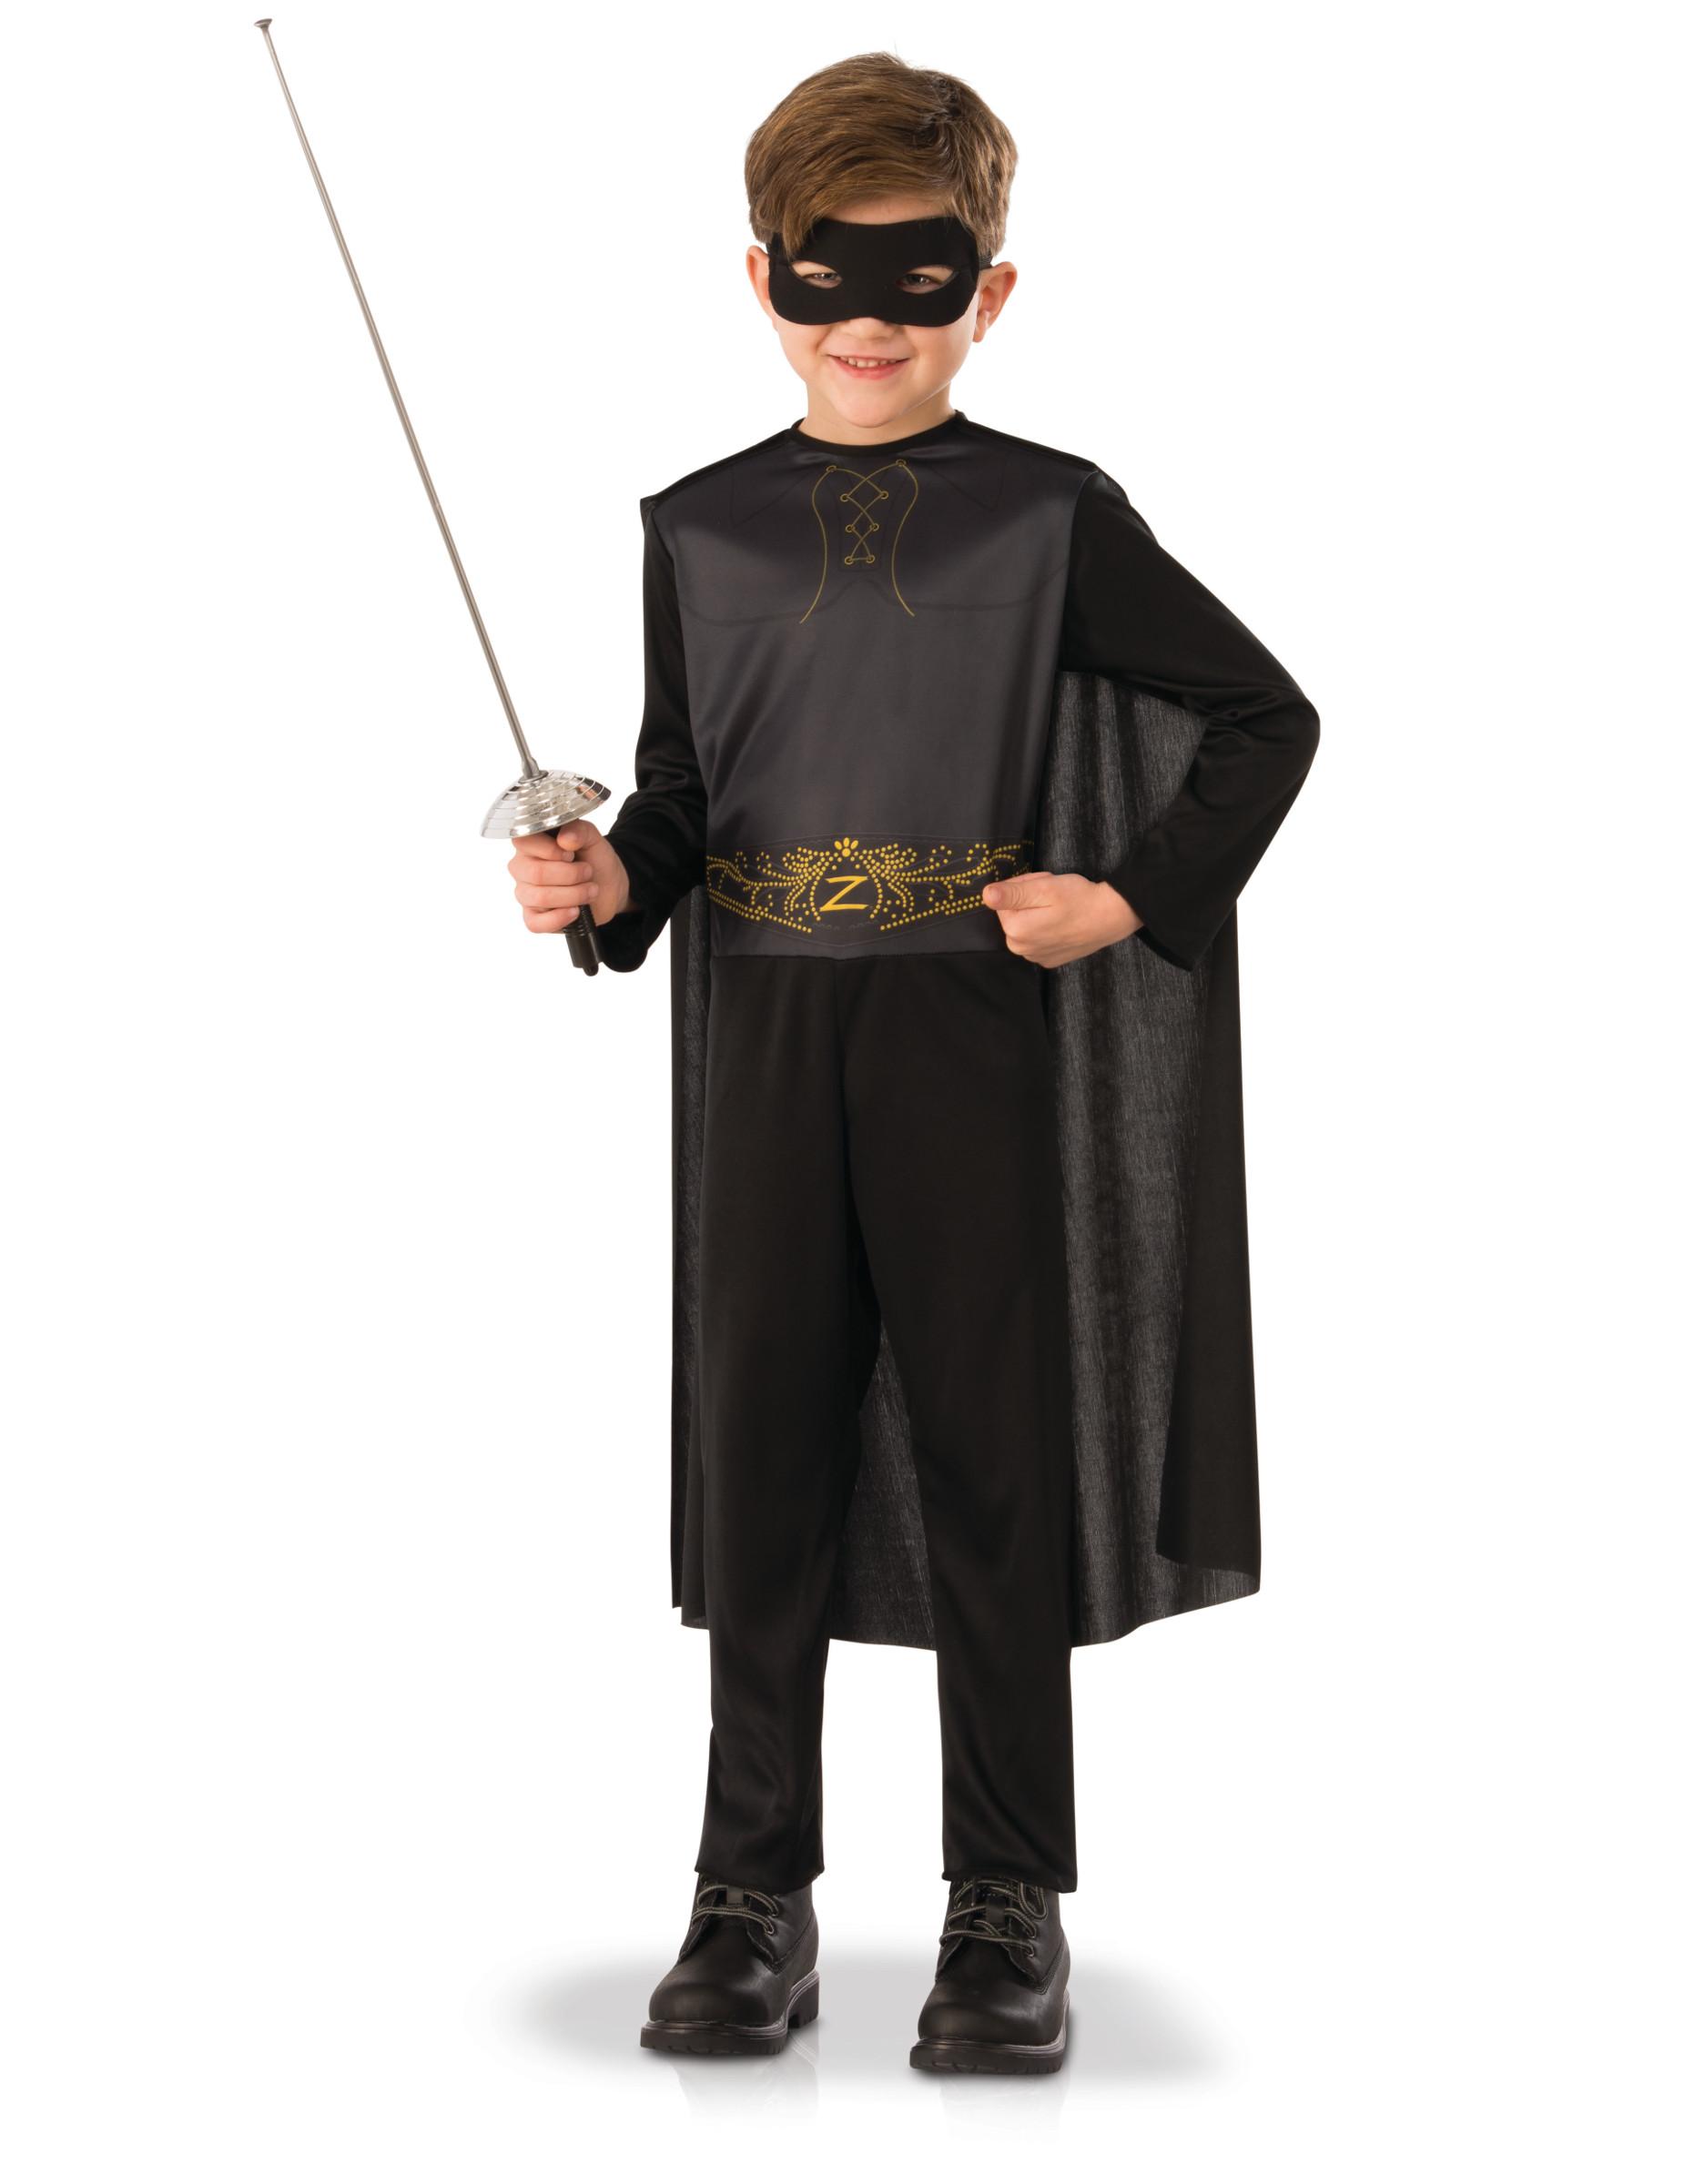 Disfarce Zorro™ menino  Disfarces Crianças 1aa8f792c69